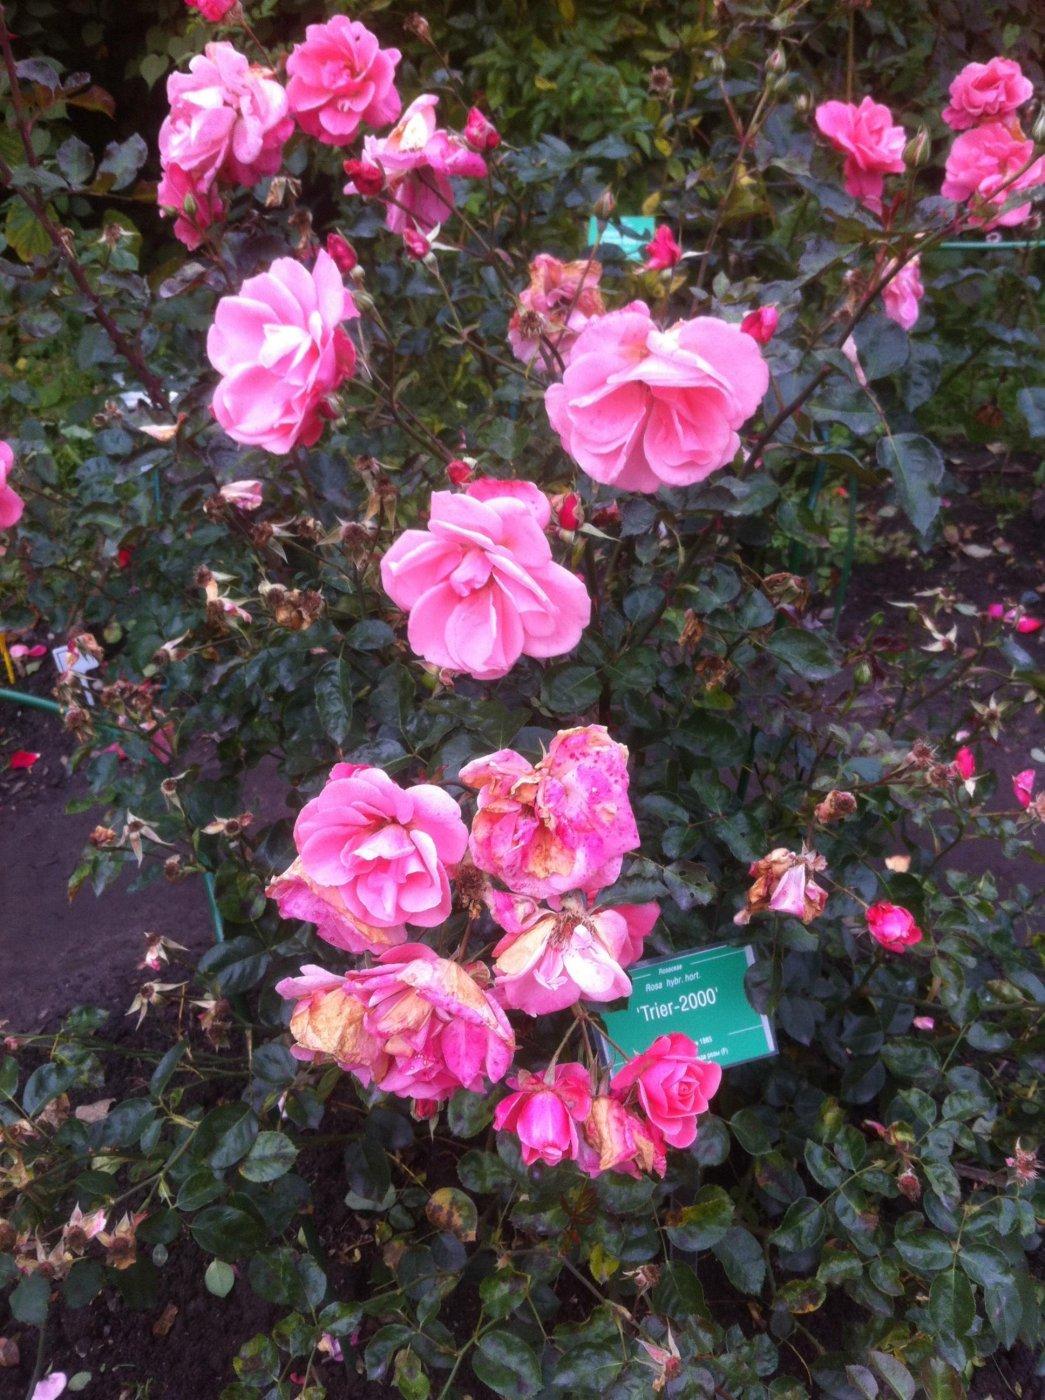 Rosa hybridis  cv. Trier-2000